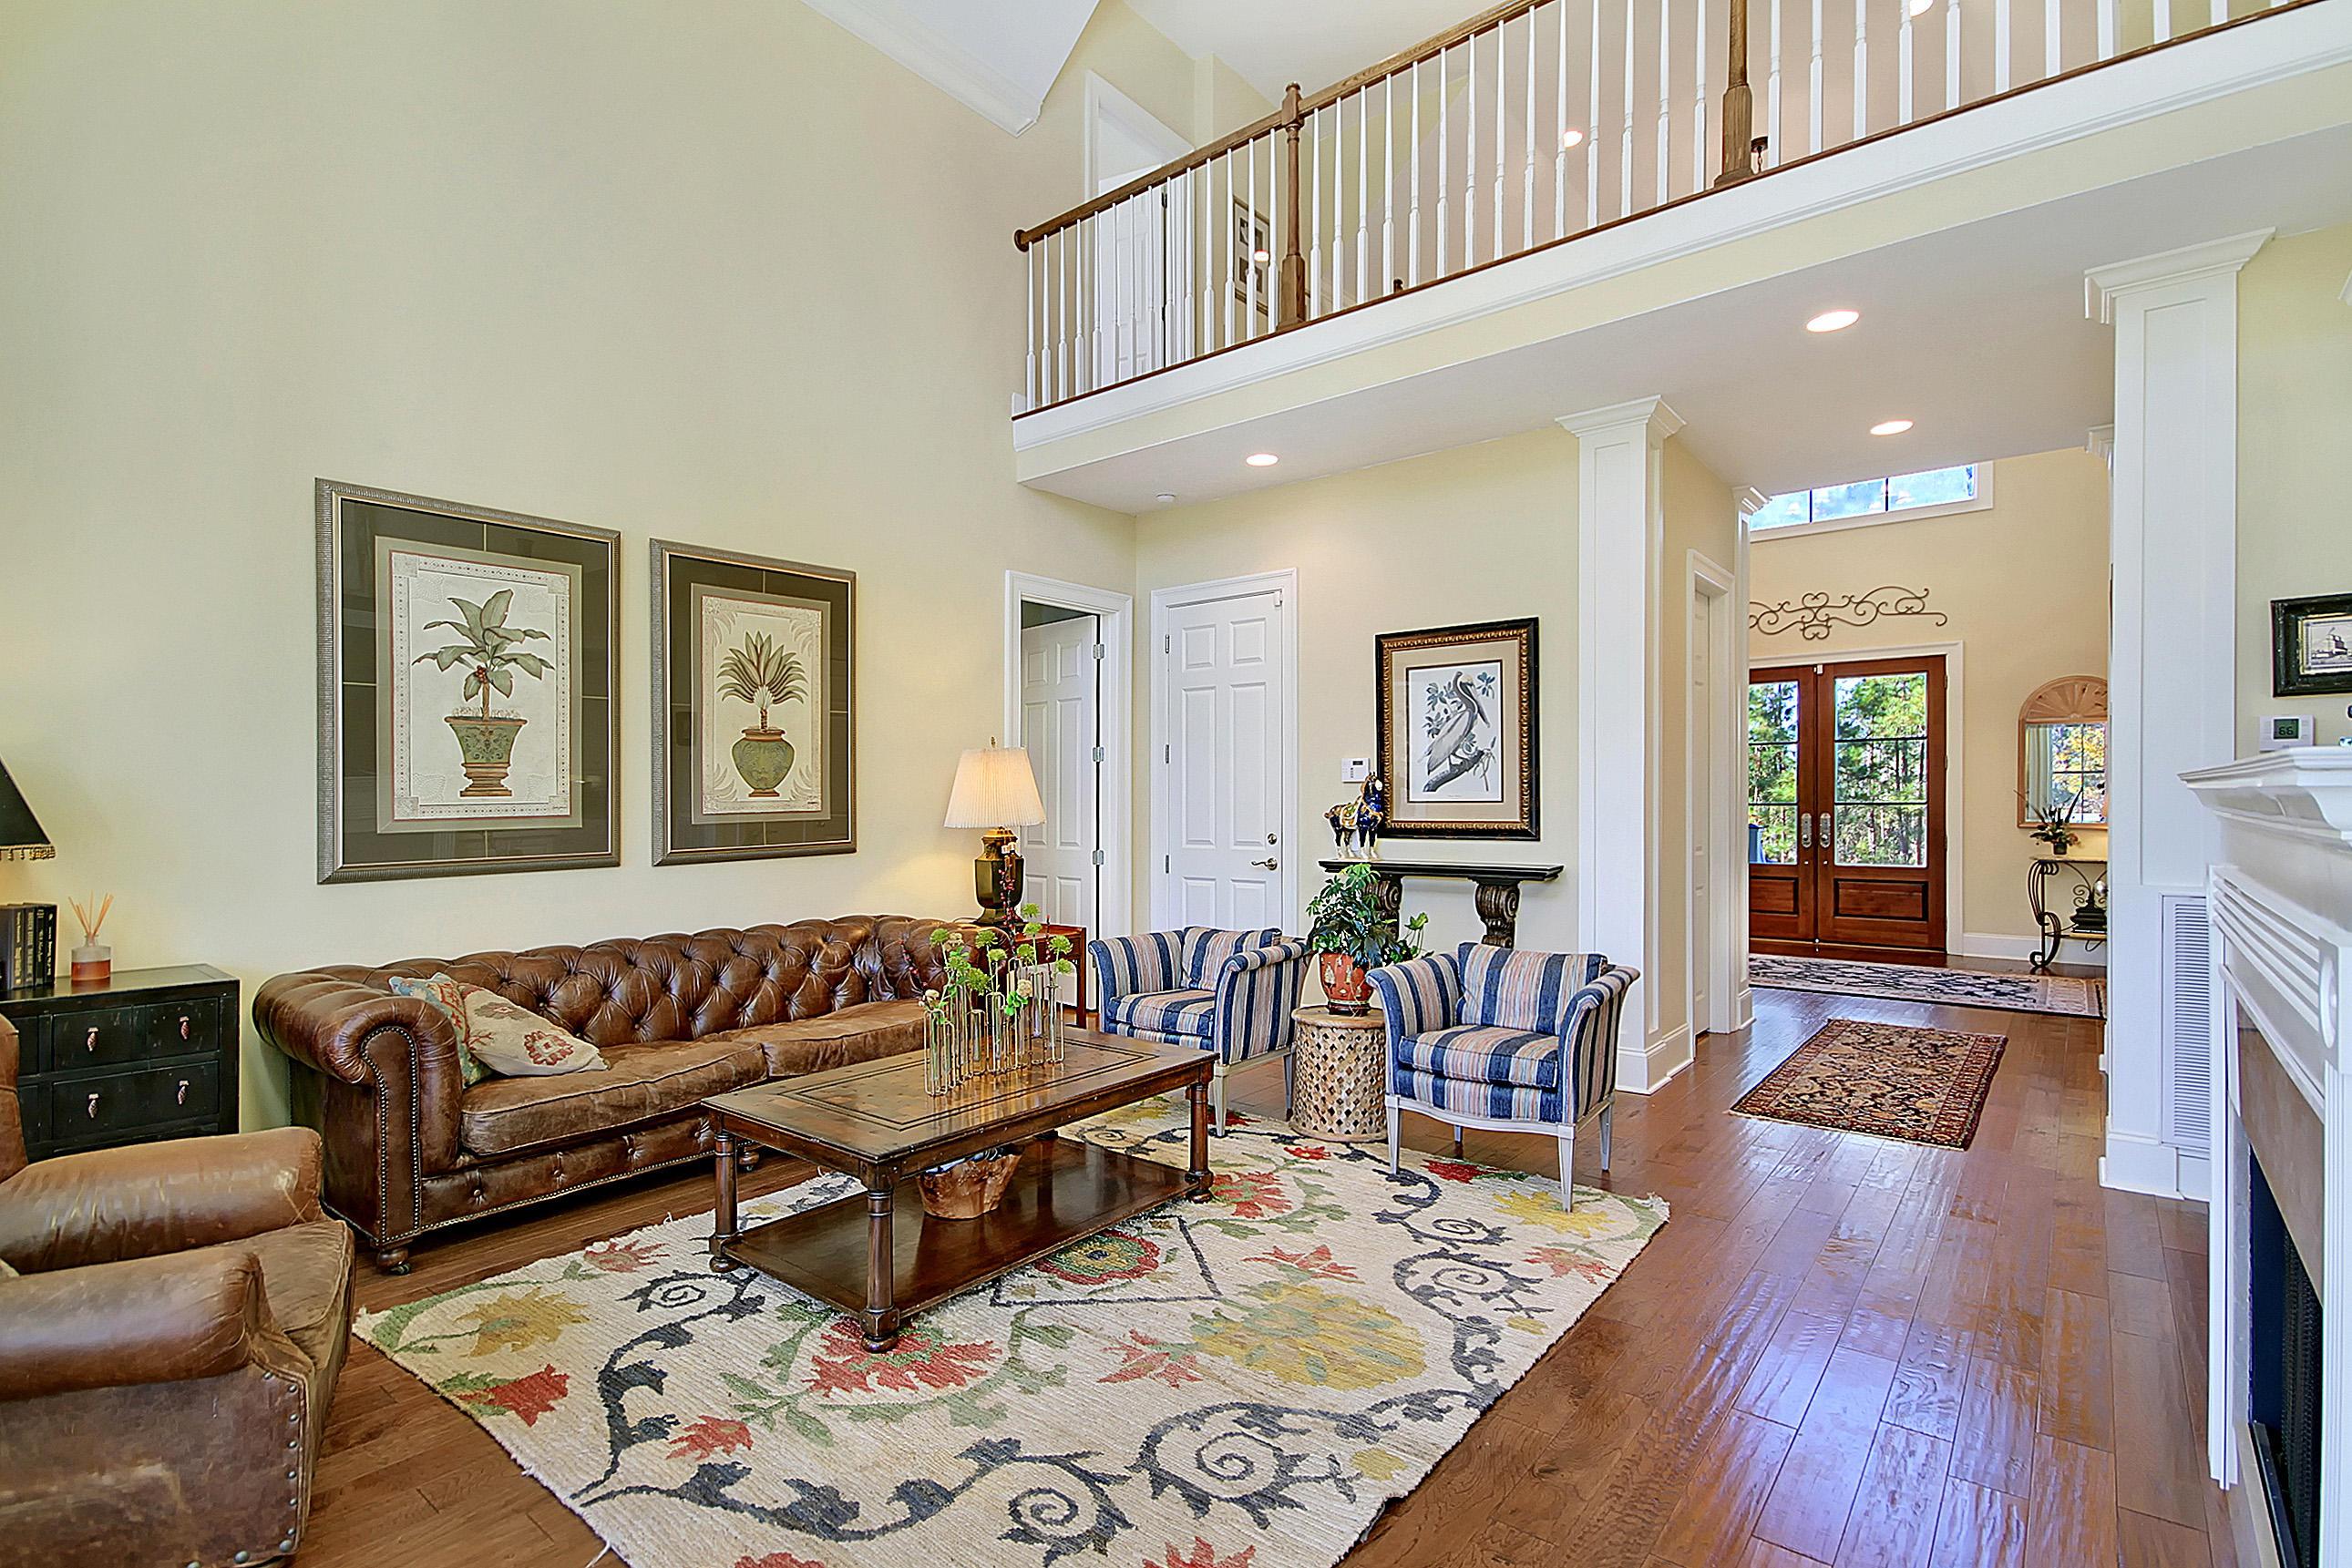 Rivertowne Country Club Homes For Sale - 2601 Kiln Creek, Mount Pleasant, SC - 26